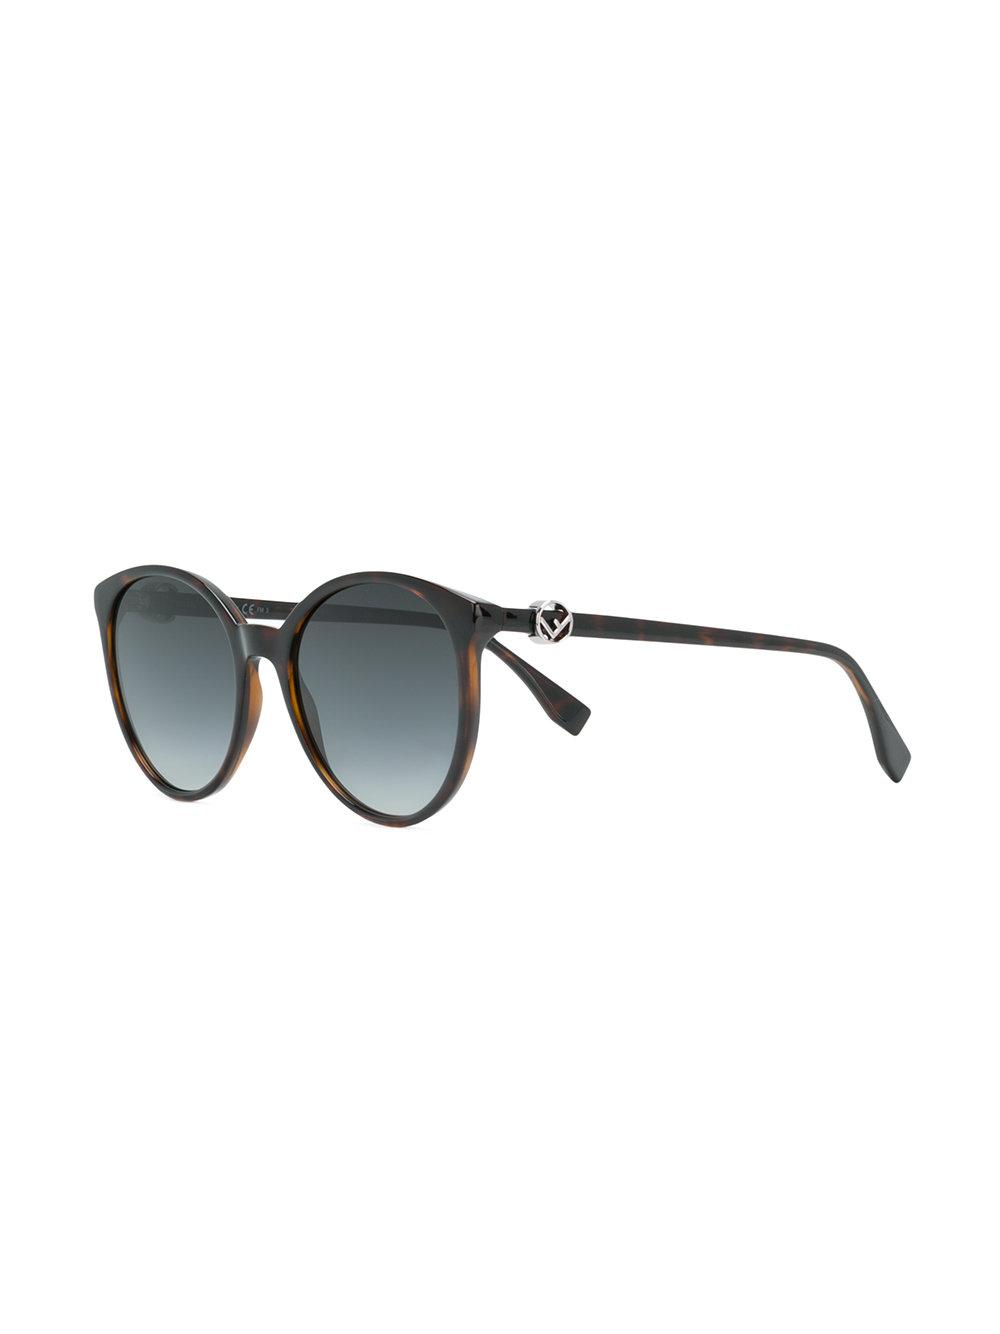 Fendi Gradient Round Sunglasses in Brown